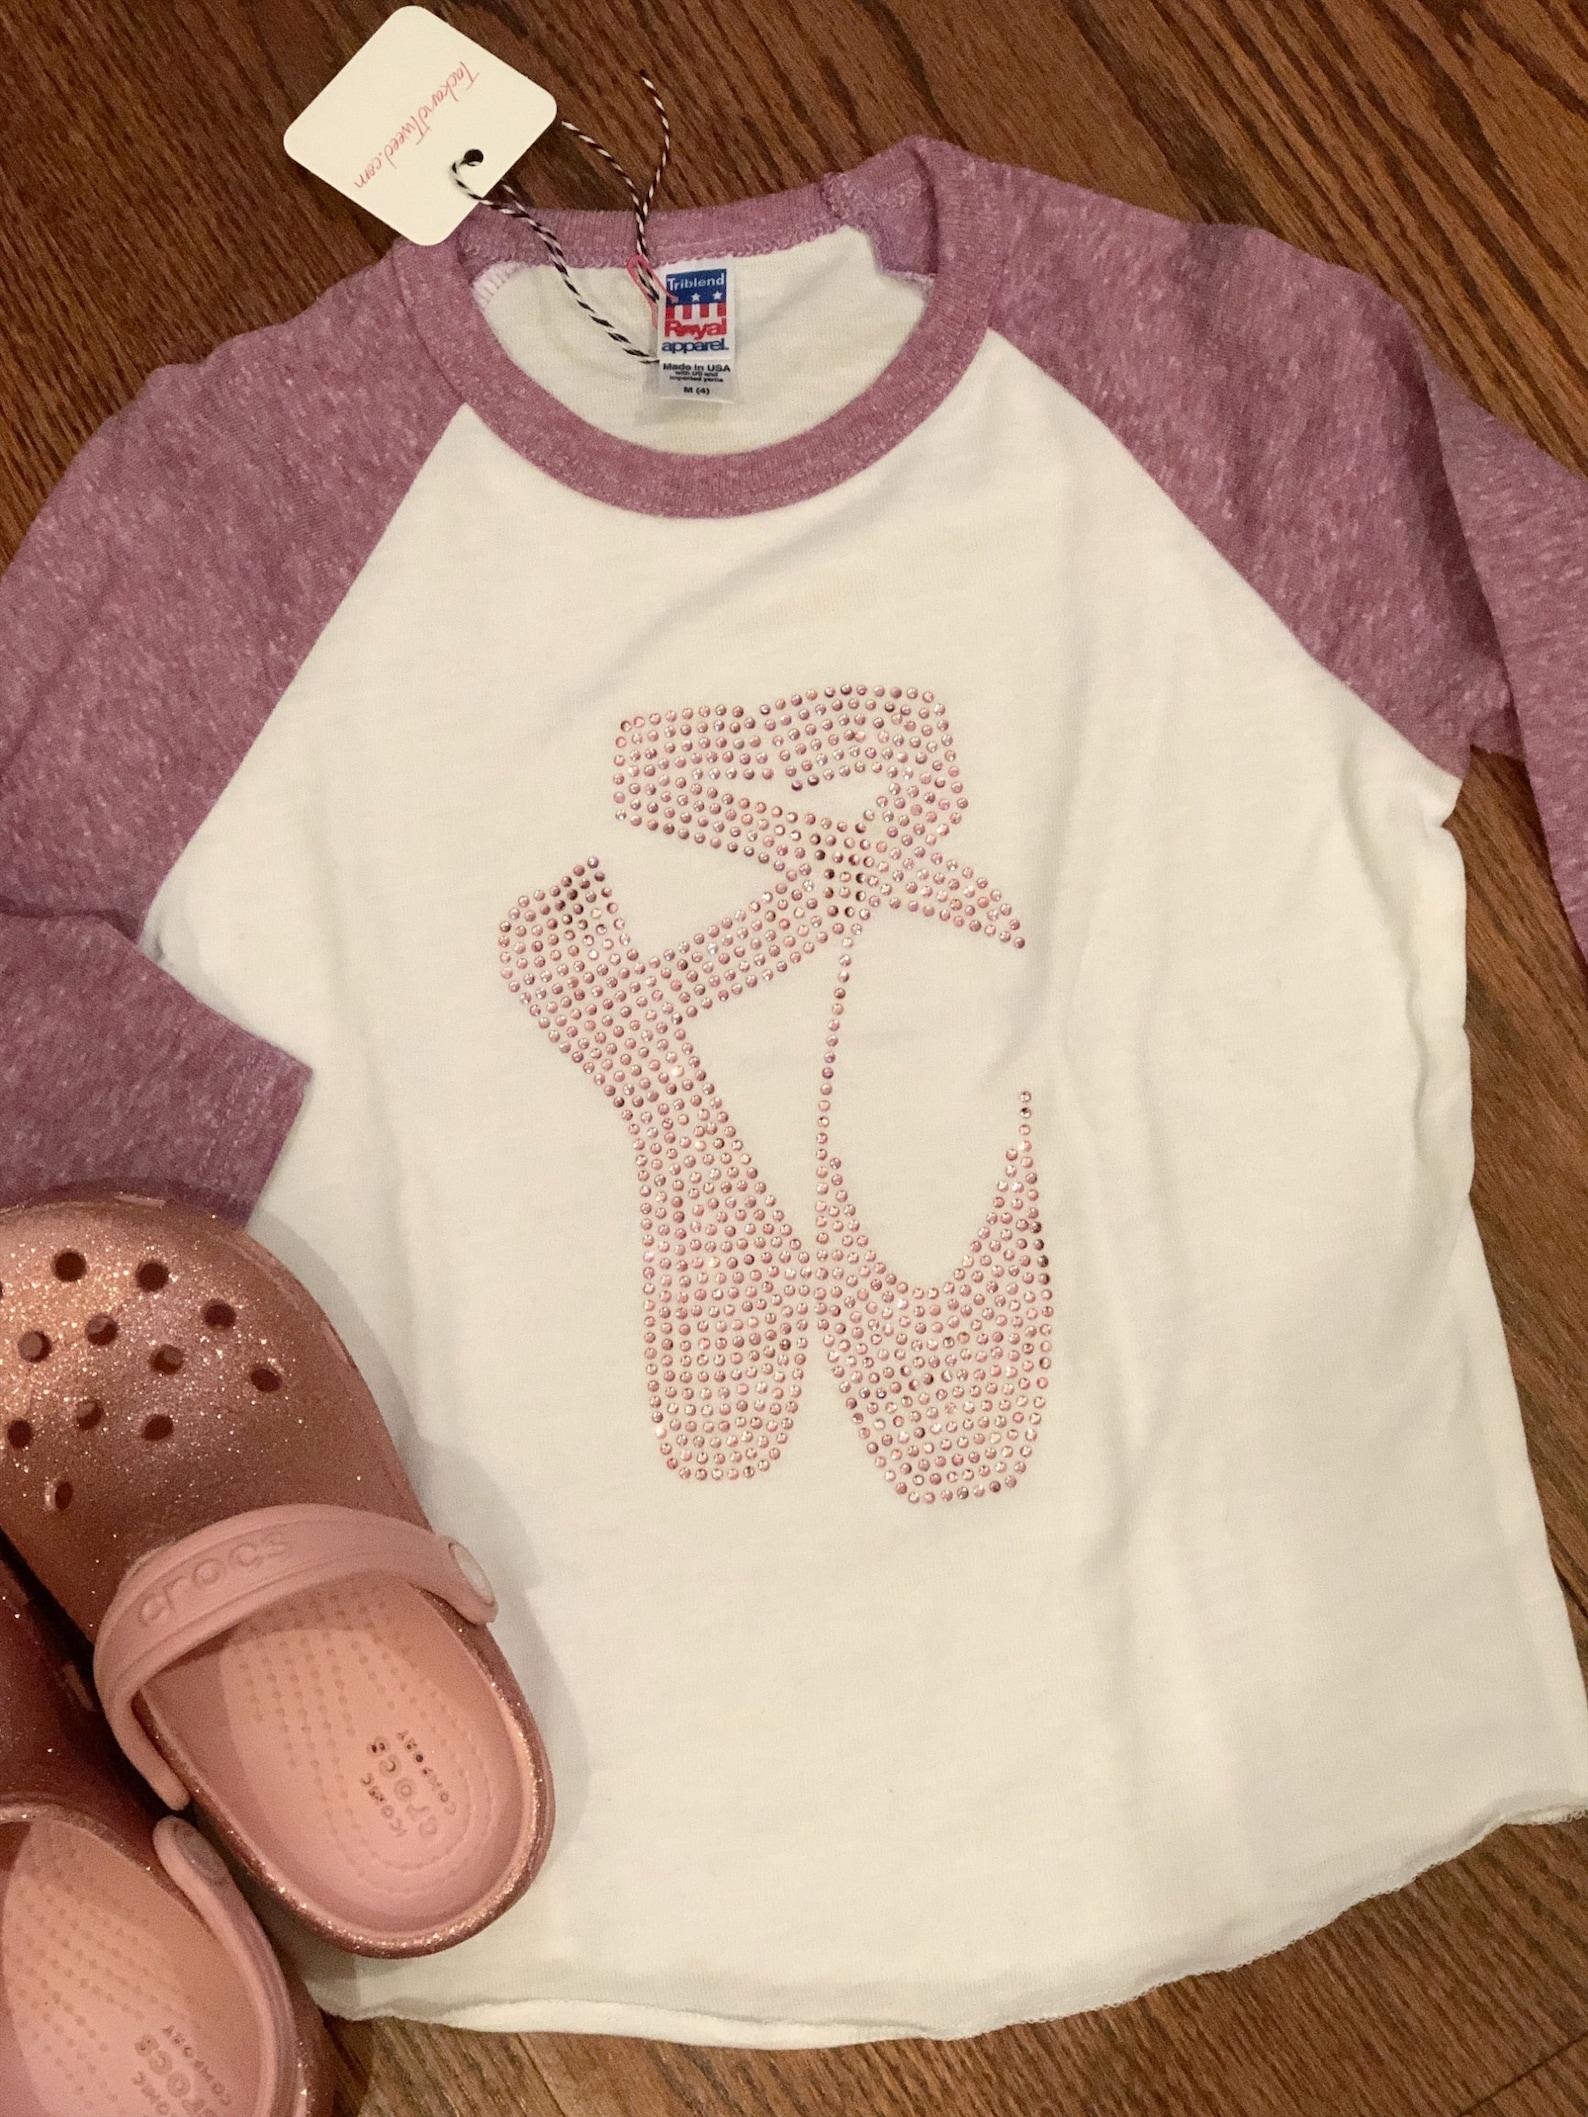 girl's ballet dance rhinestone shoes t-shirt youth and little kids baseball raglan pink purple 3/4 sleeve